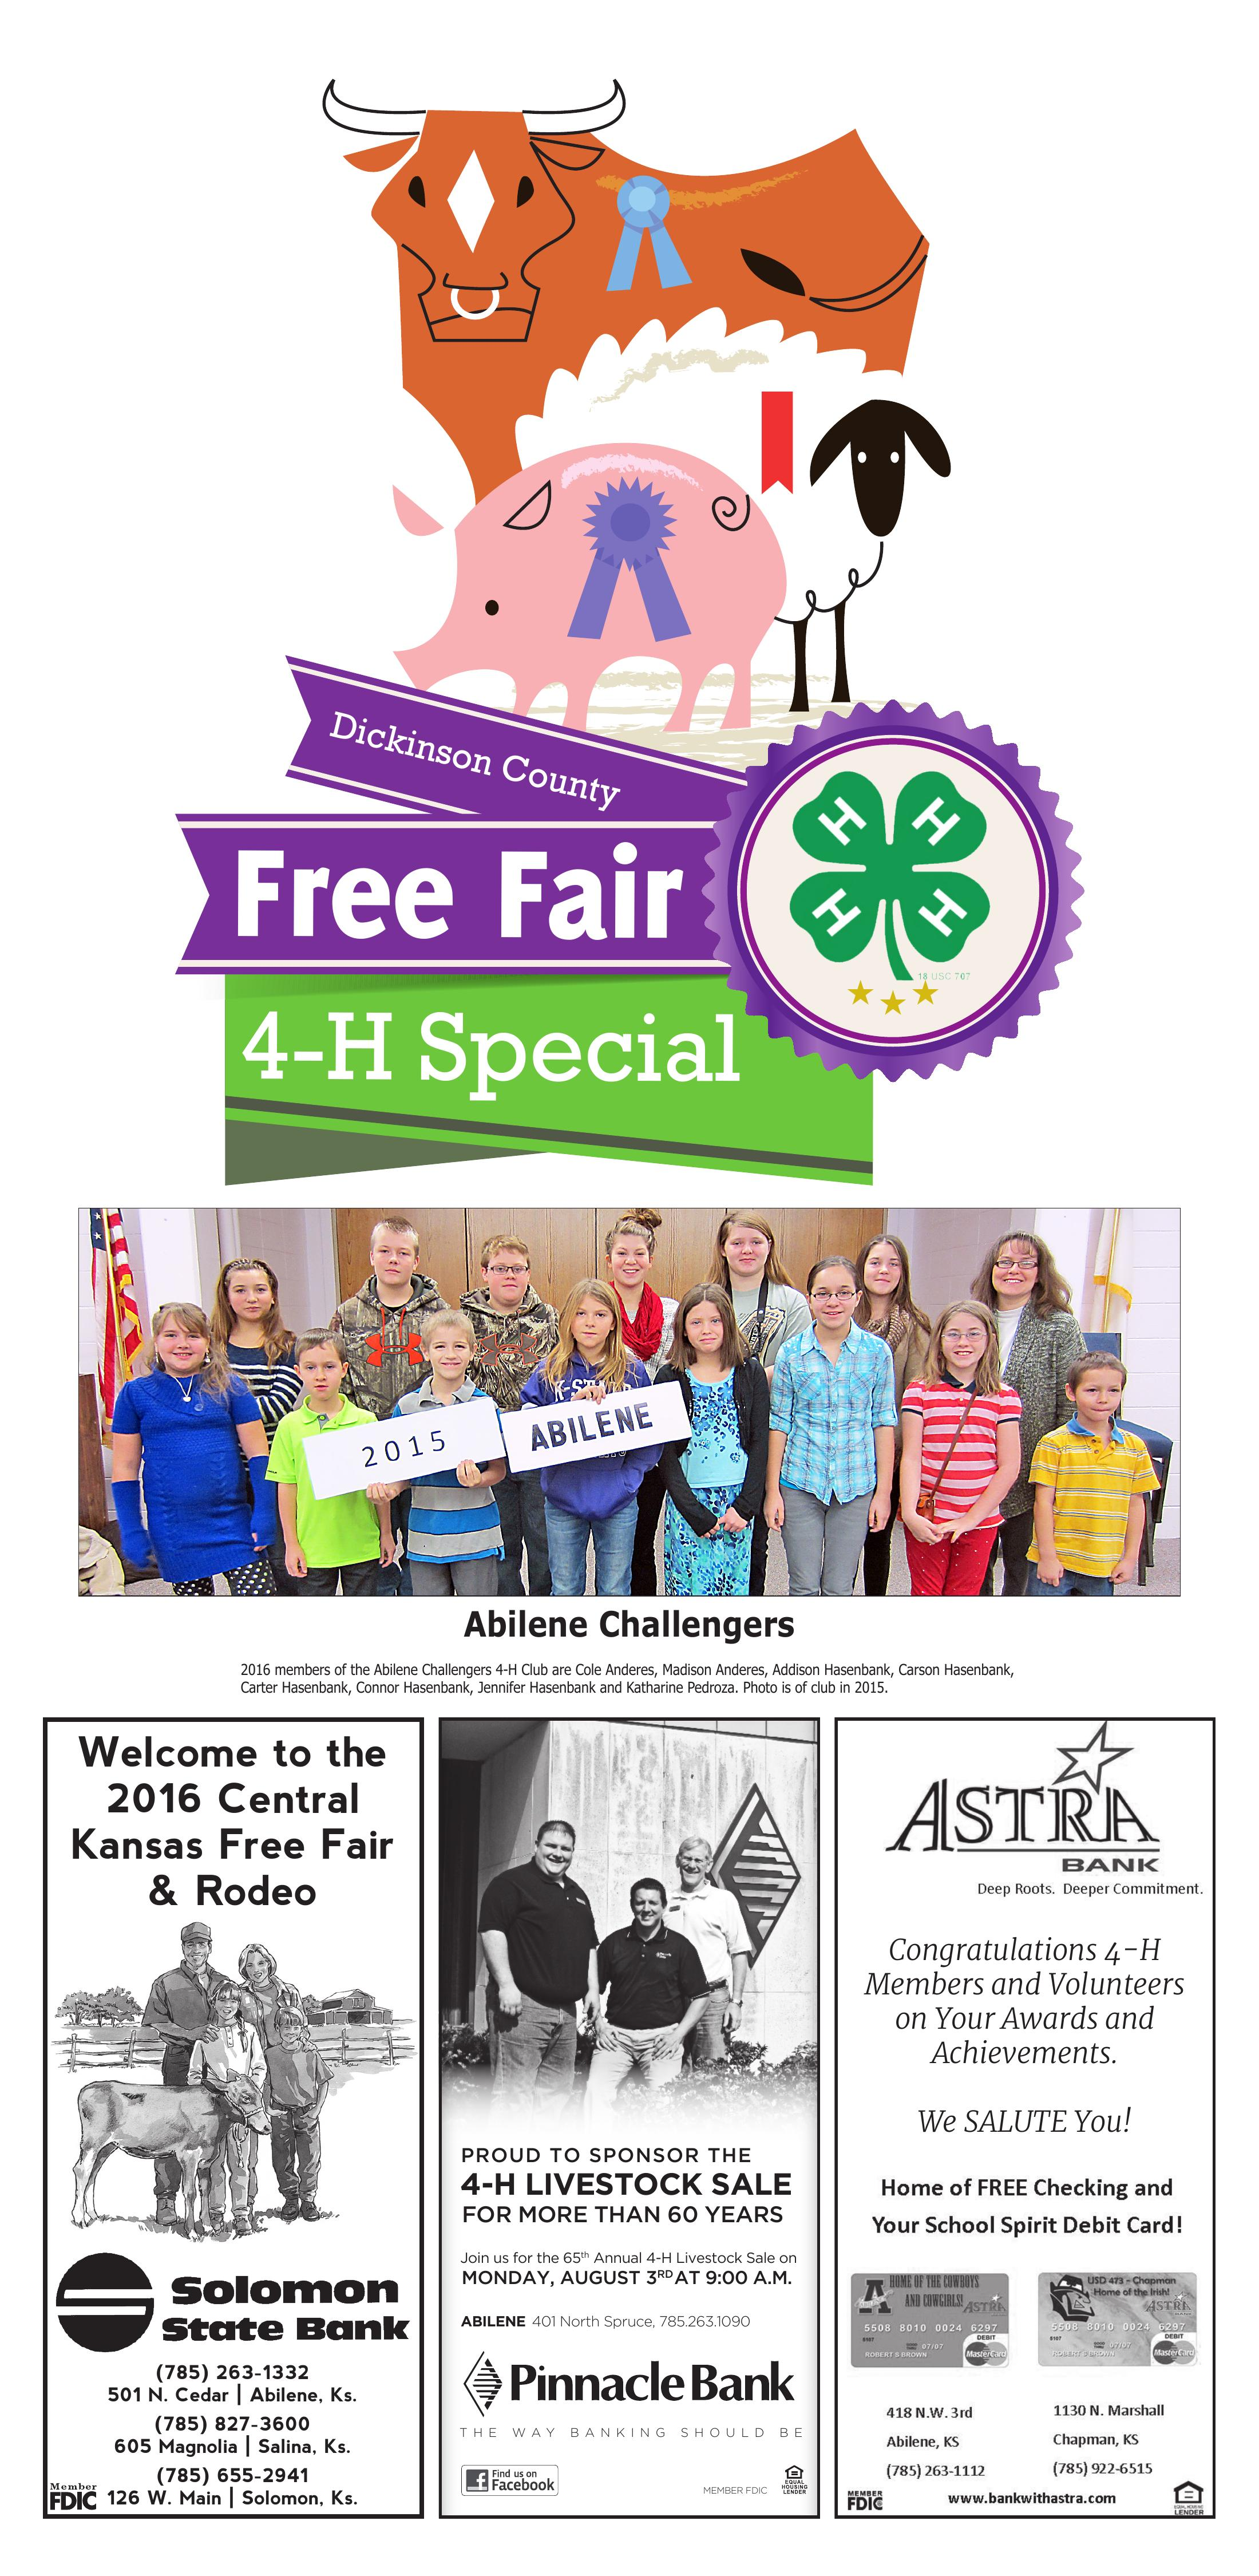 Kansas dickinson county solomon - Dickinson County Free Fair 1